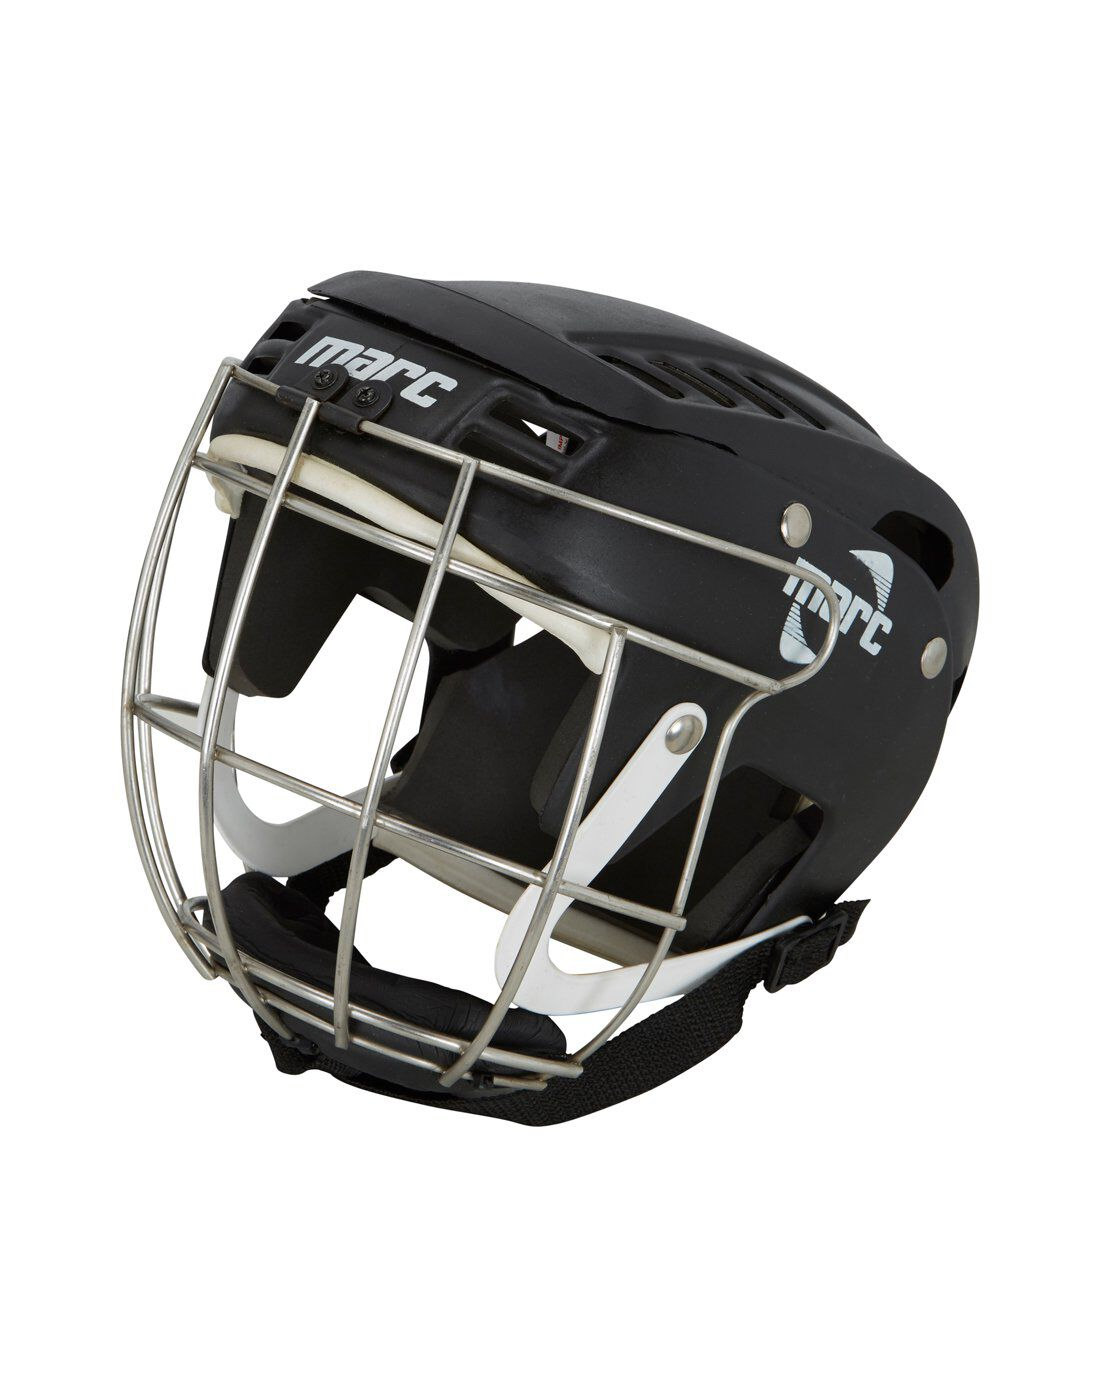 Marc Hurling Helmet | Black | Life Style Sports